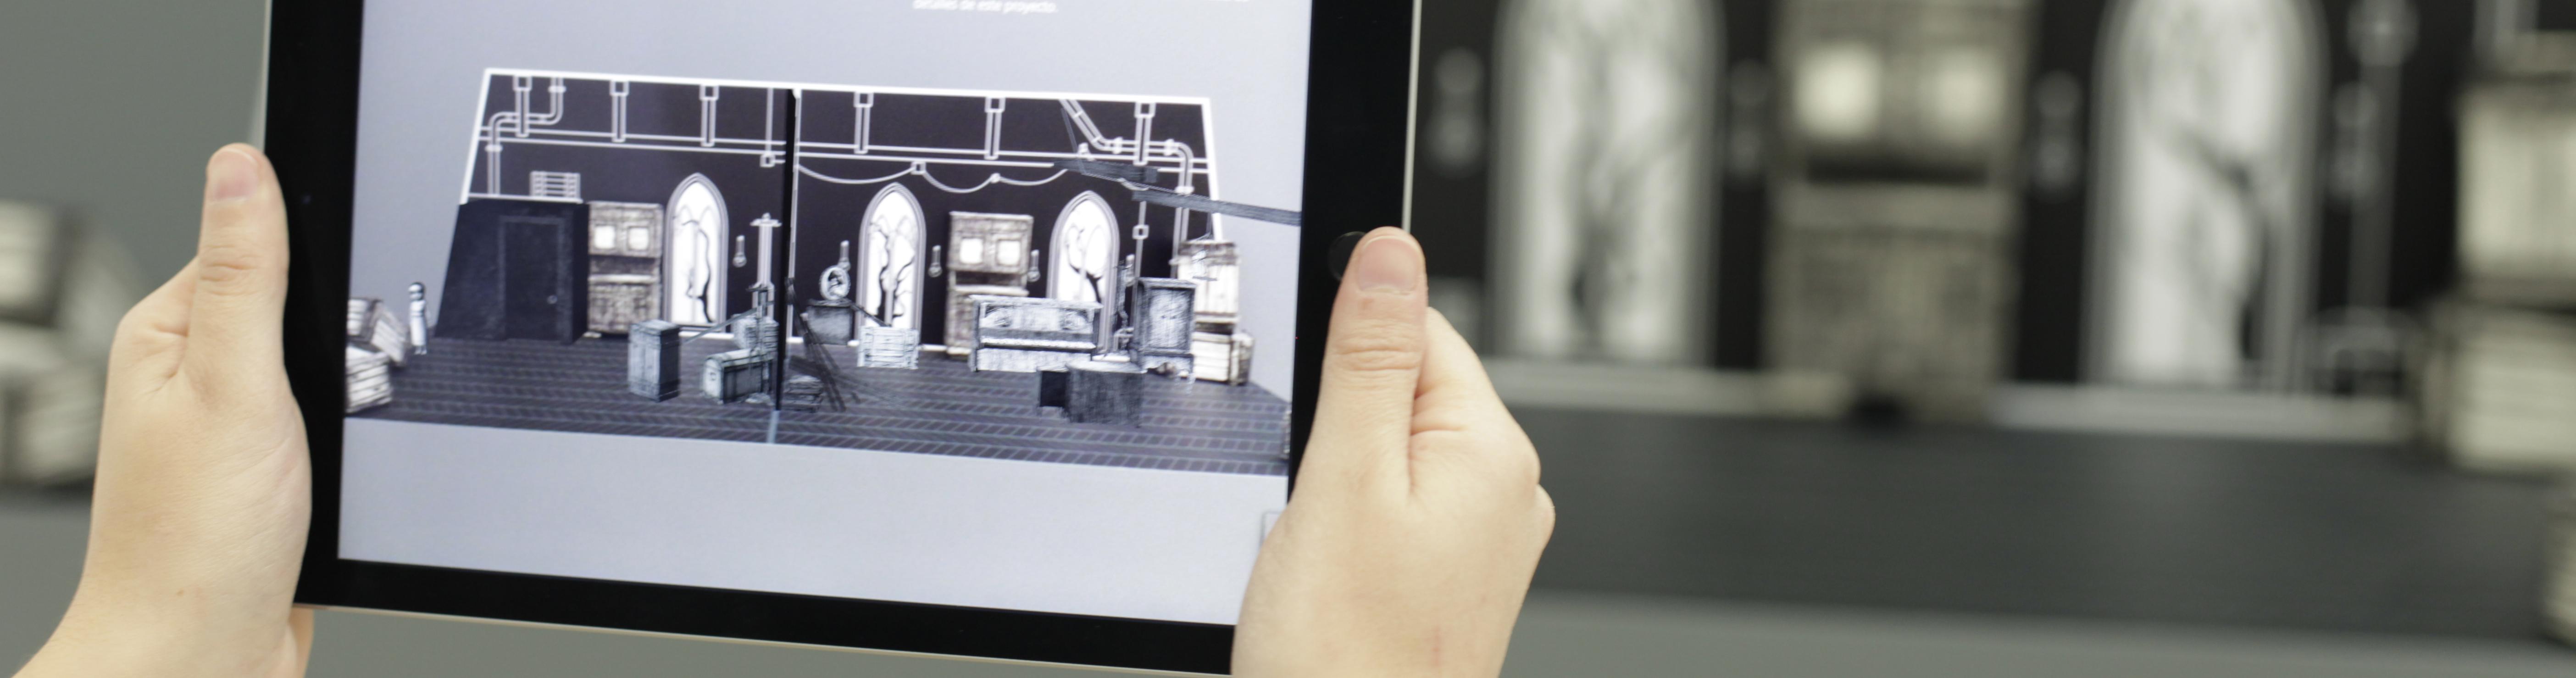 Teatro interactivo realidad aumentada ©Unit Experimental, UPV_web